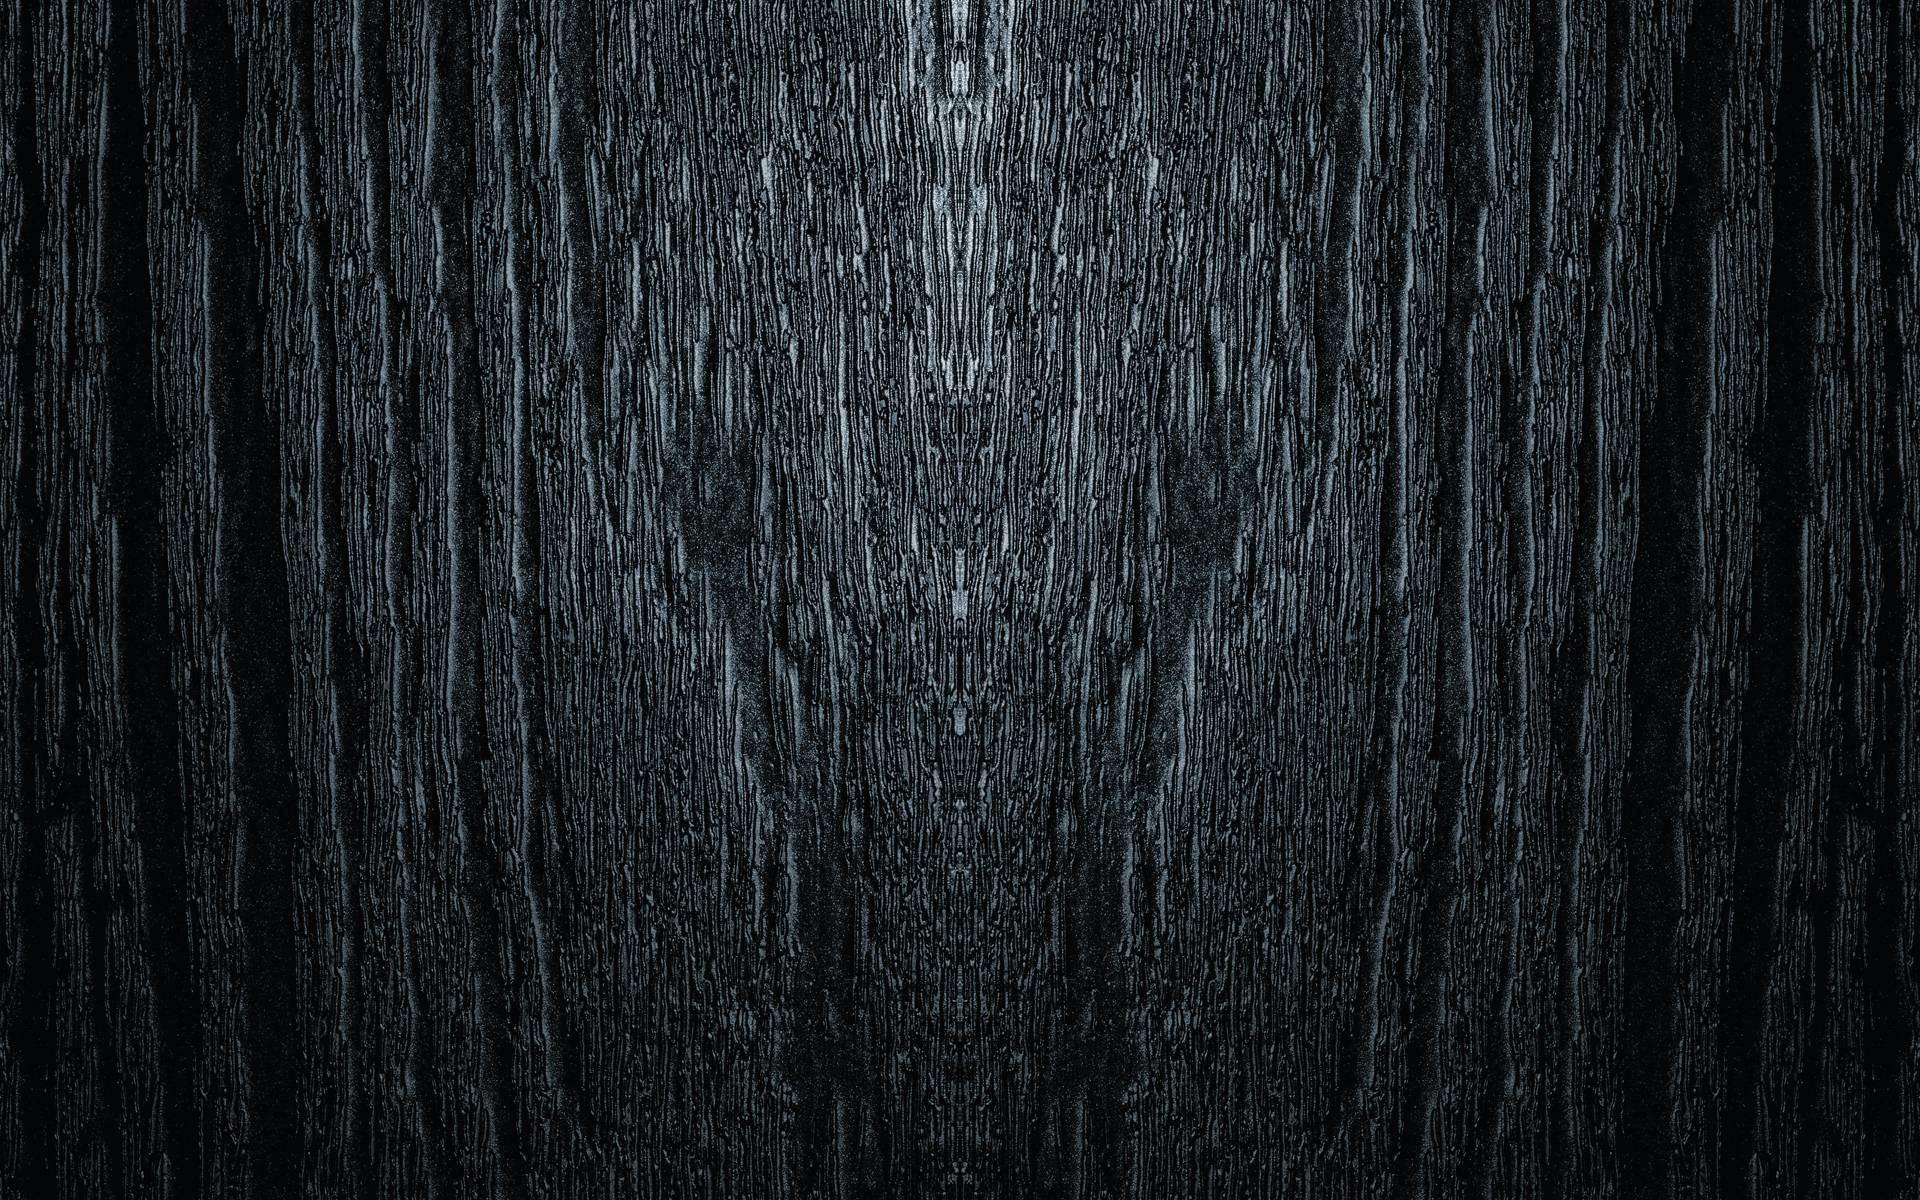 Imvu backgrounds 36 images - Dark wood wallpaper ...